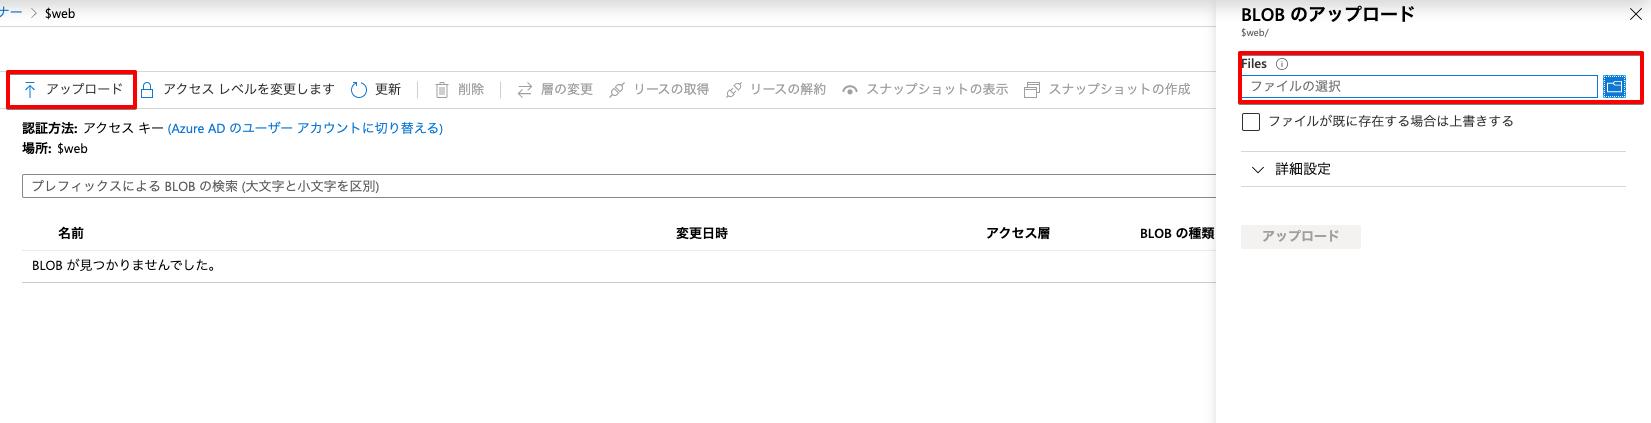 BLOB のアップロード - Microsoft Azure 2020-02-21 12-29-45.png